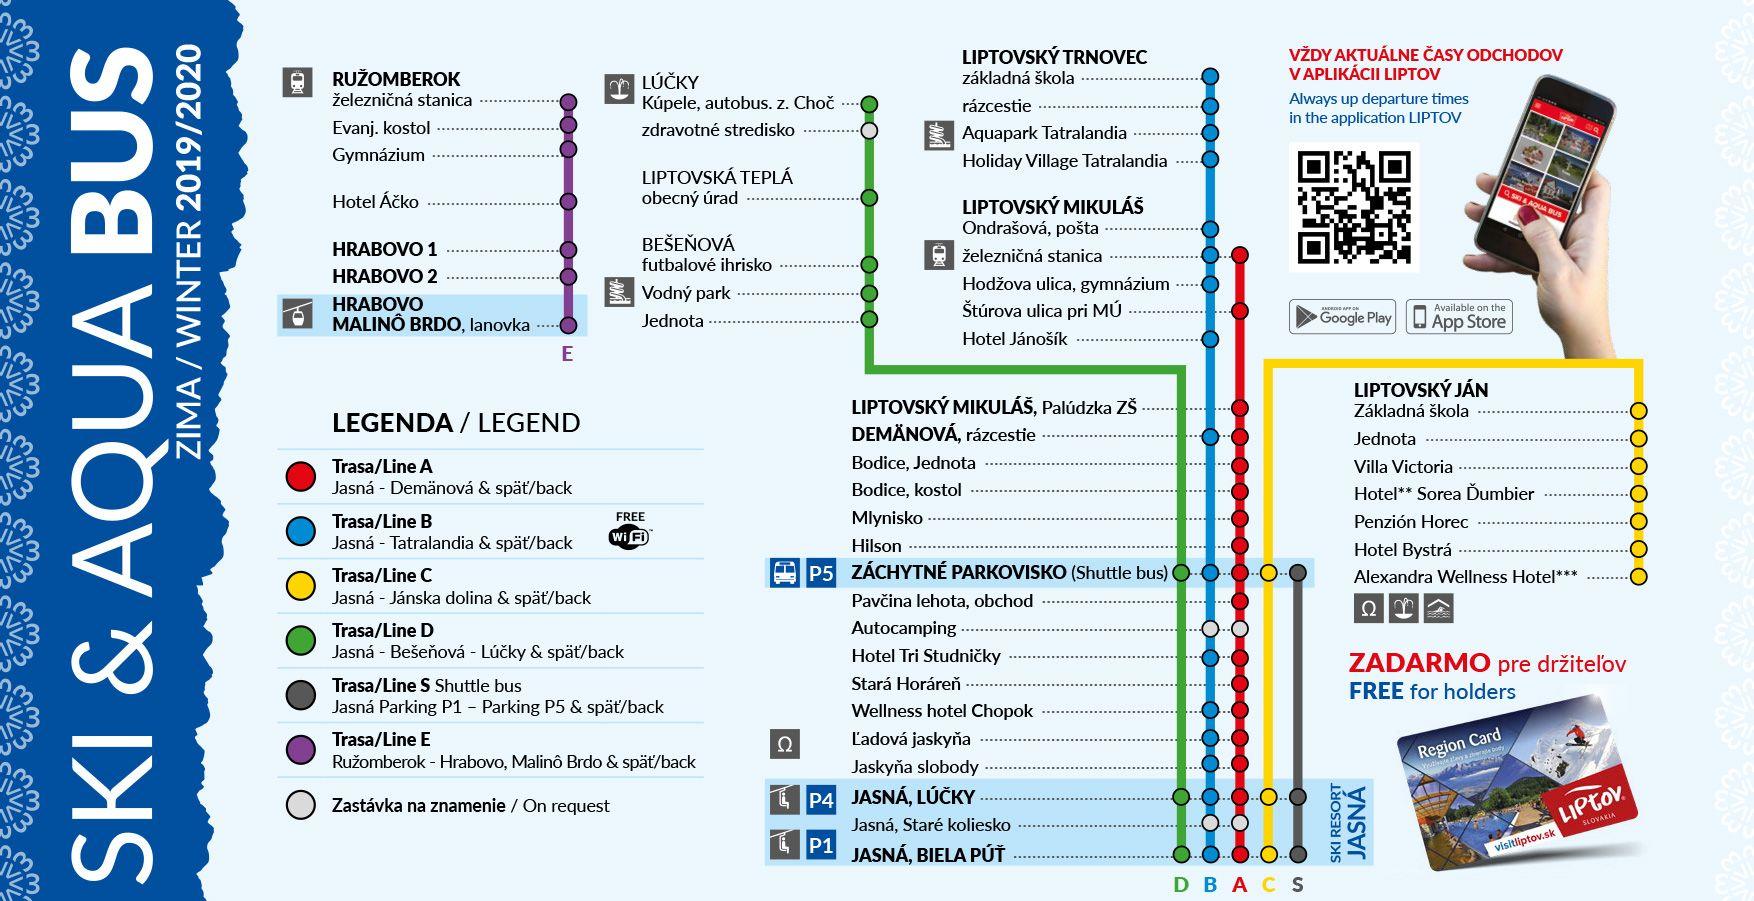 mapa skibus 2019 2020